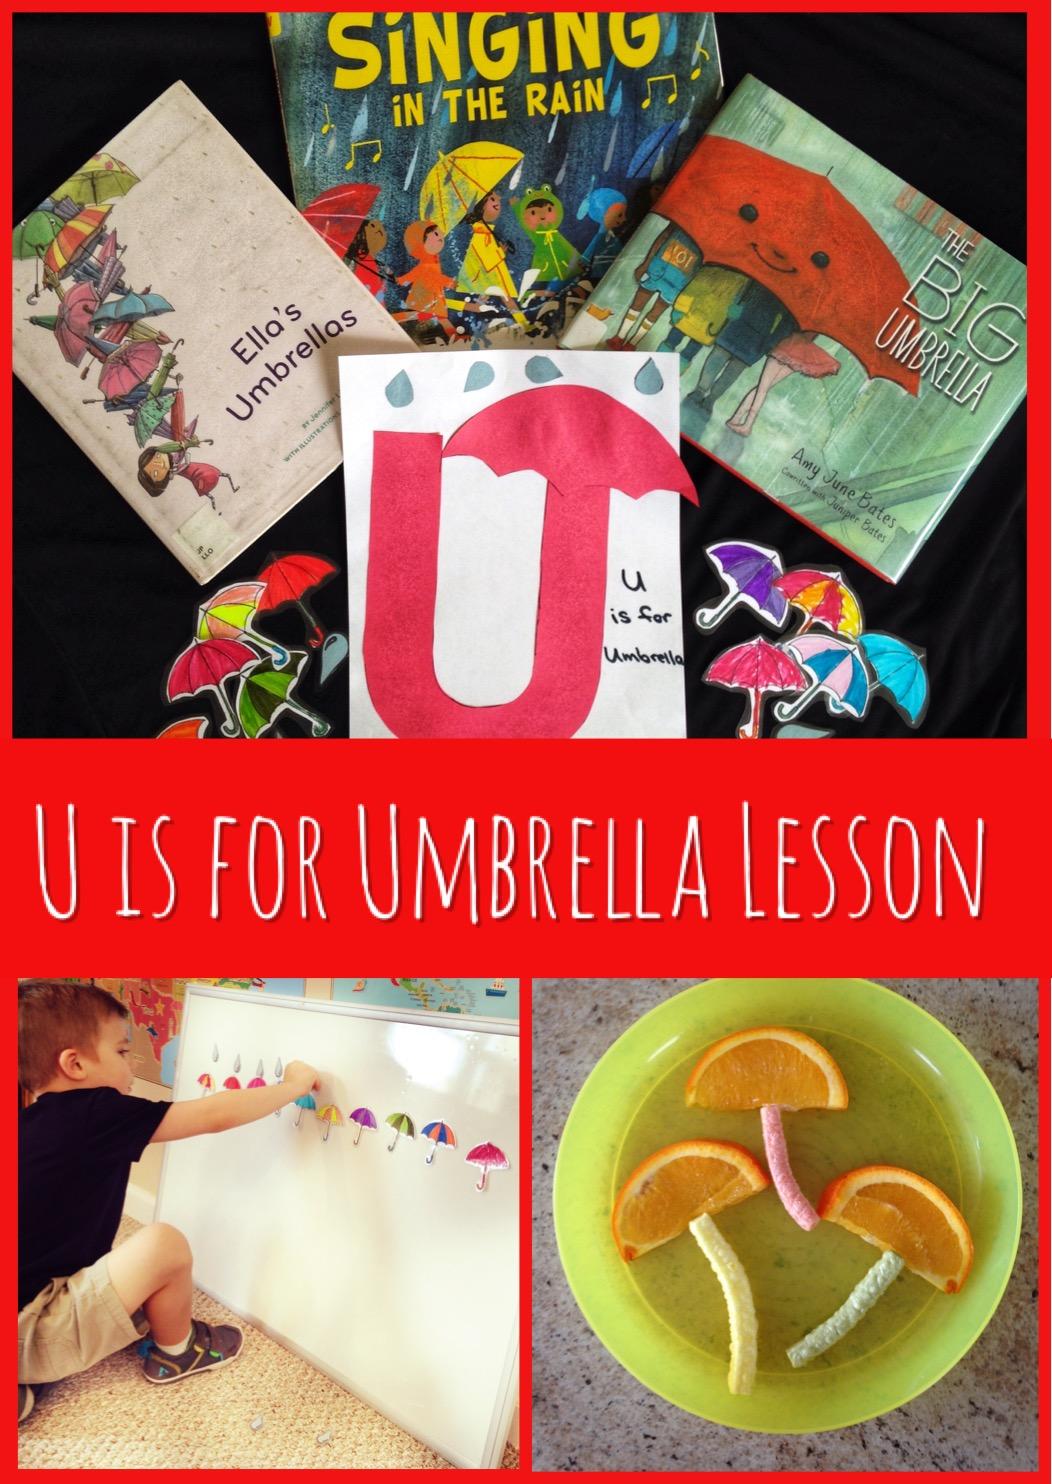 U is for Umbrella Preschool Lesson